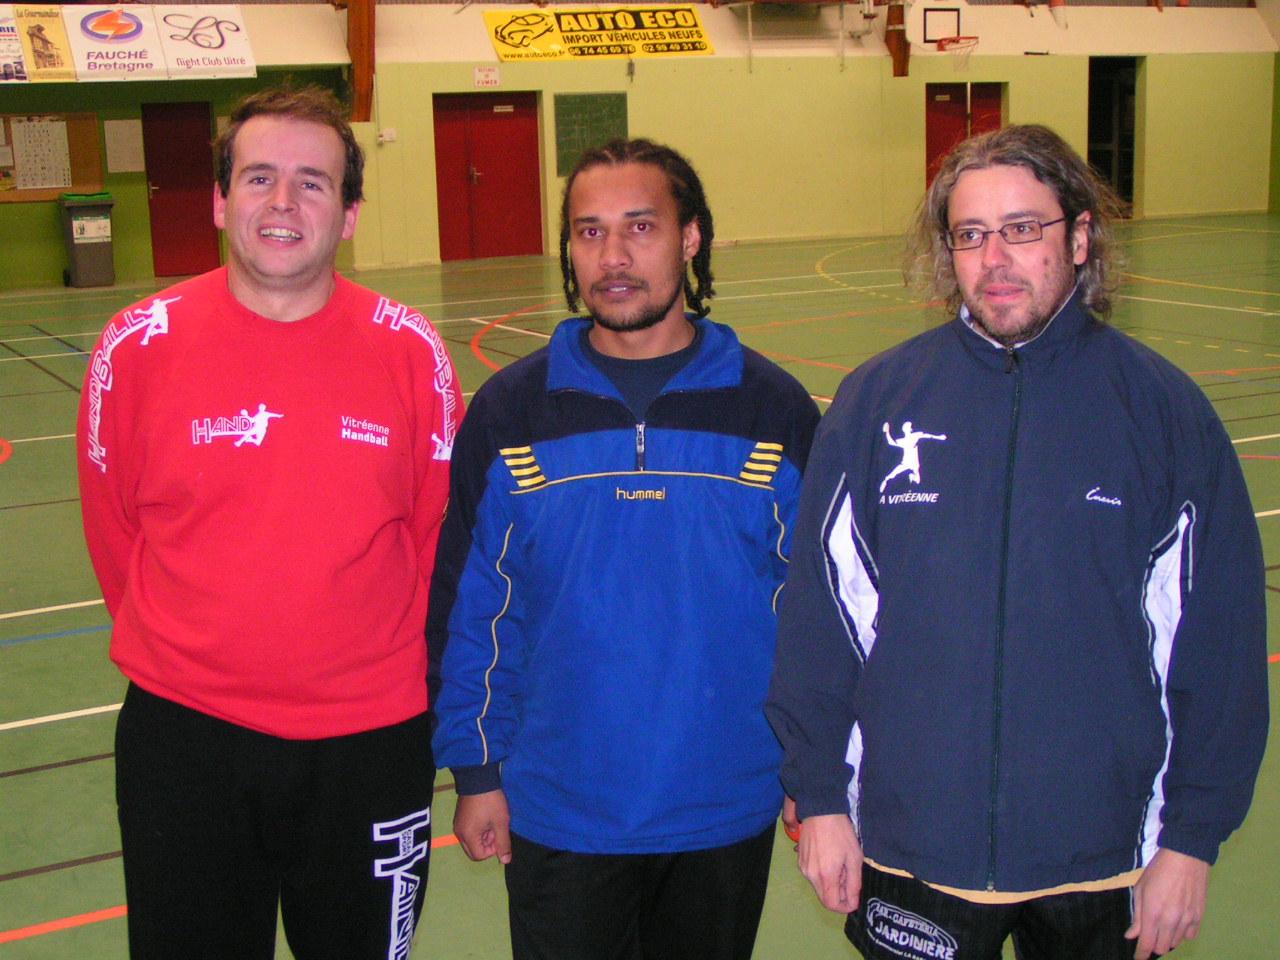 Dahlin Mondroha entraineur de la vitréenne handball